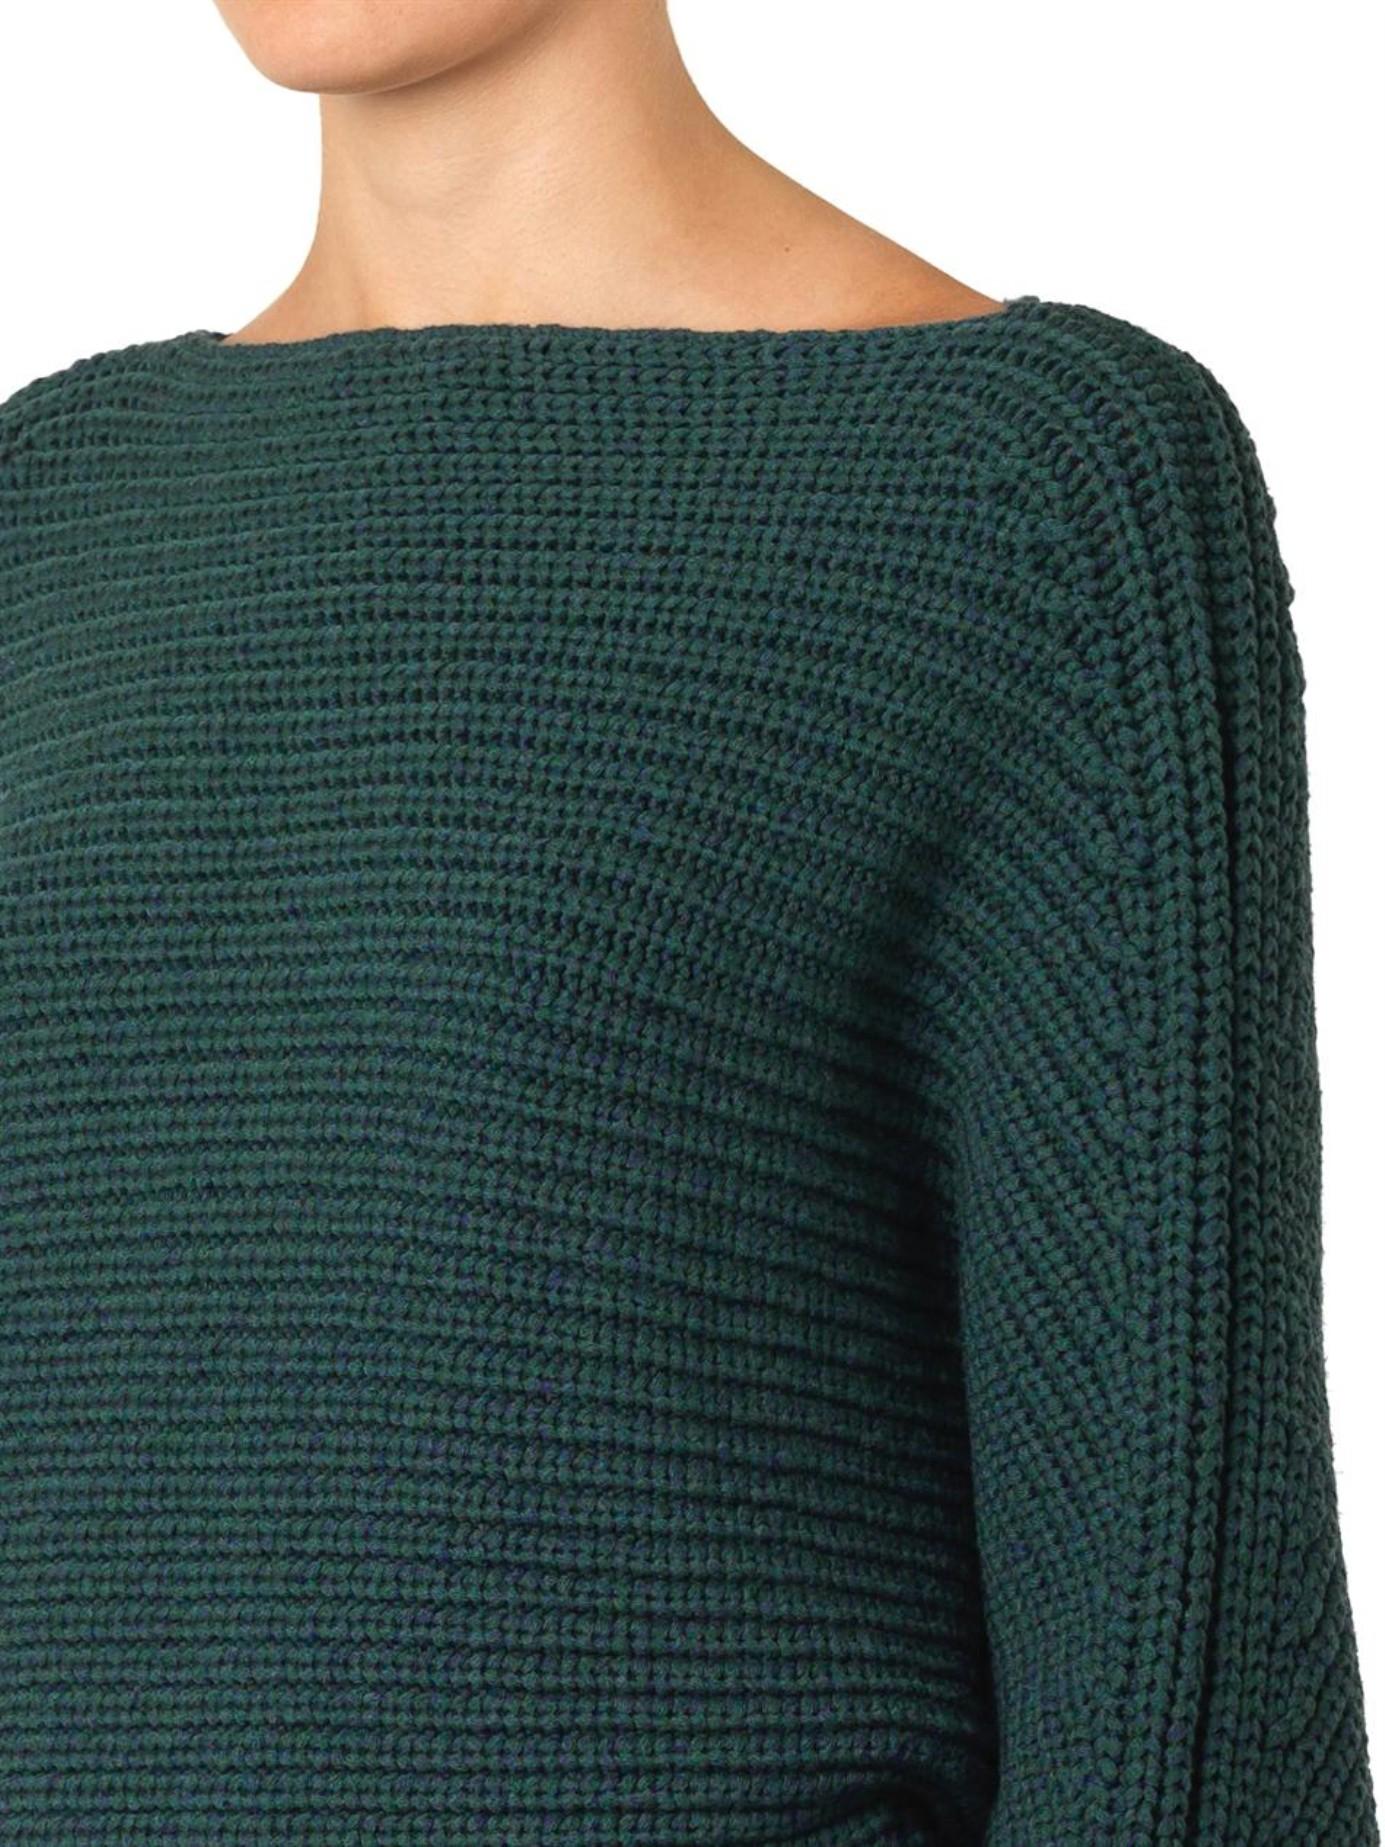 Alexander wang Tubular-Knit Wool Cropped Sweater in Green | Lyst